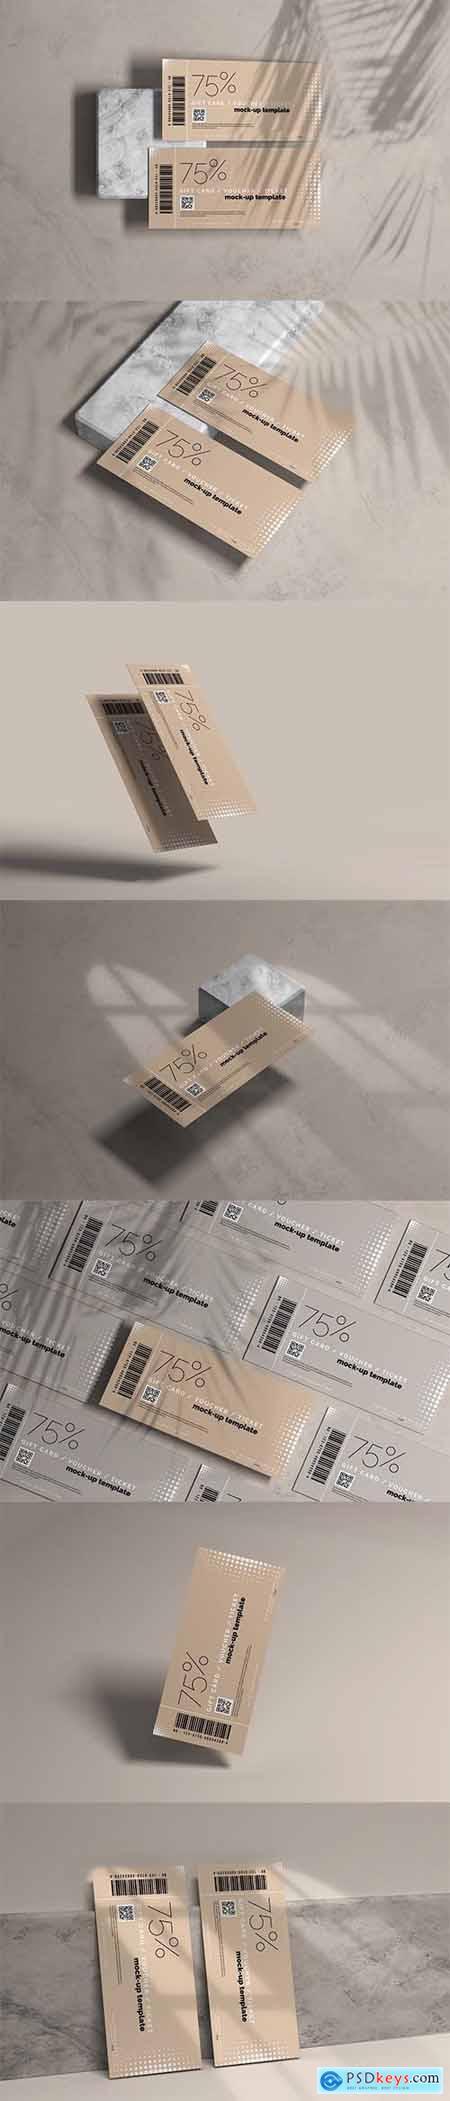 Voucher or Ticket Mockup 5606918